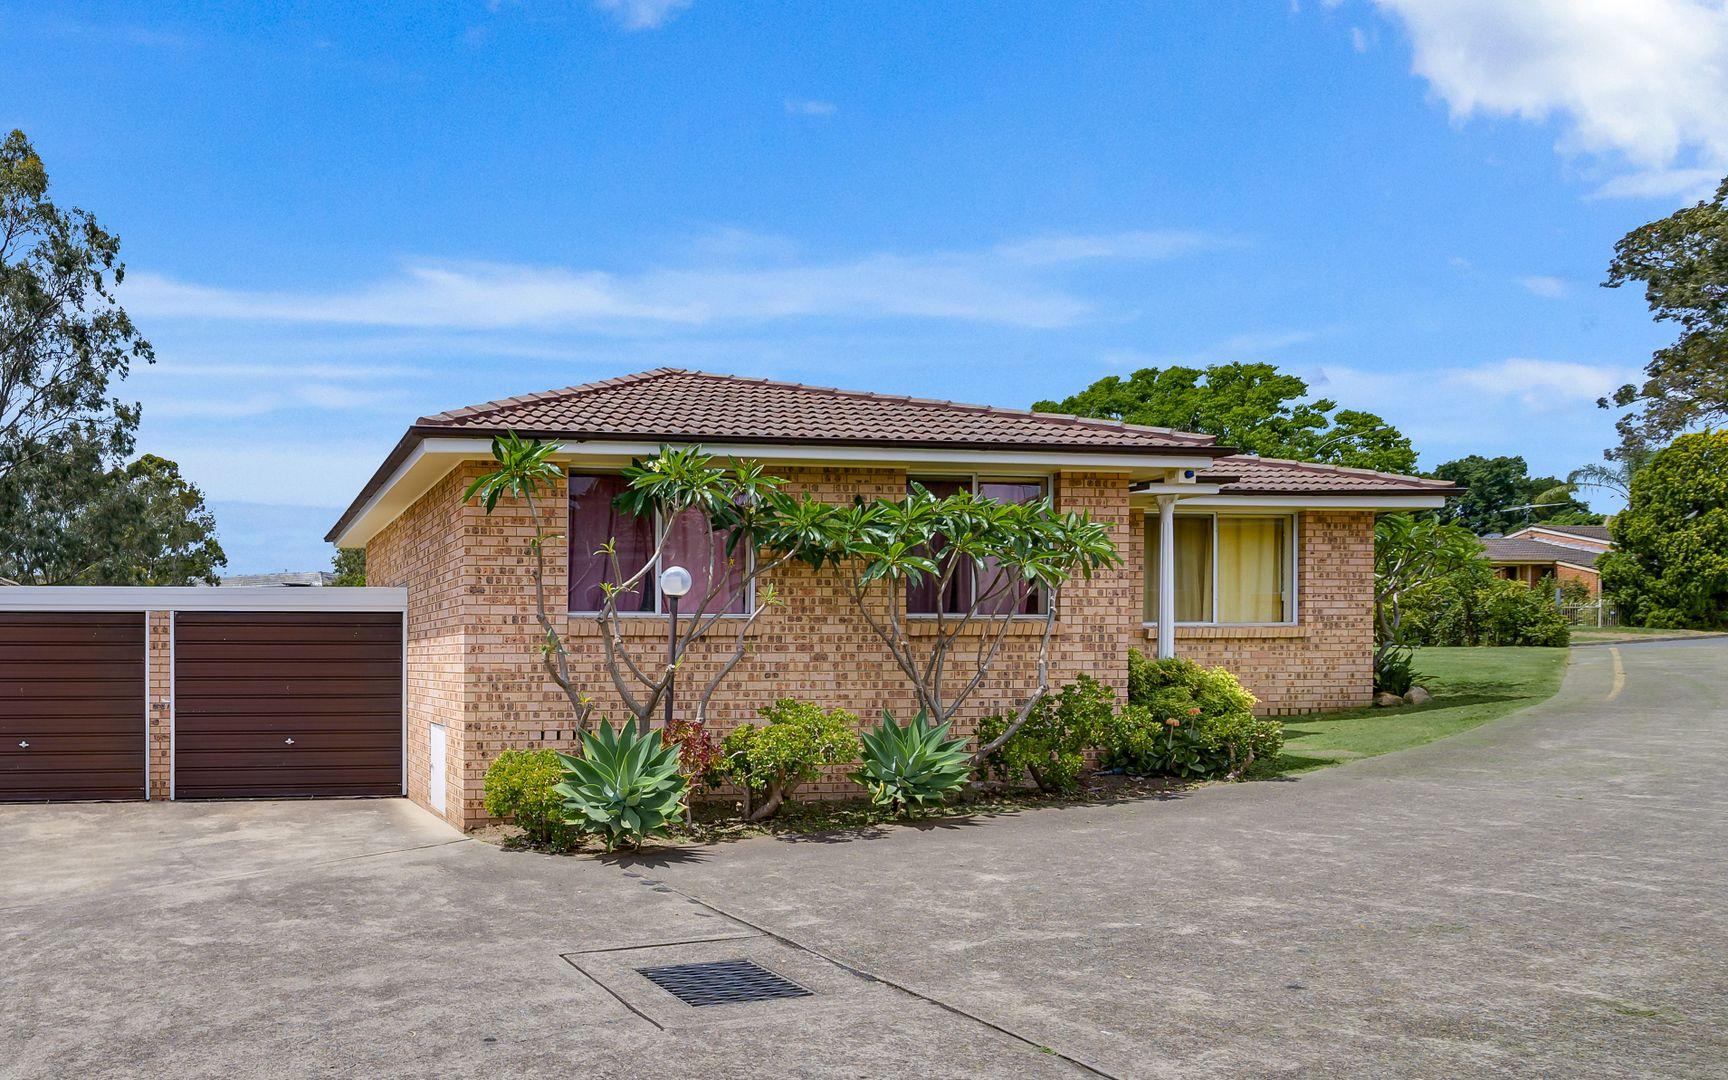 30/4 Sitella Place, Ingleburn NSW 2565, Image 0